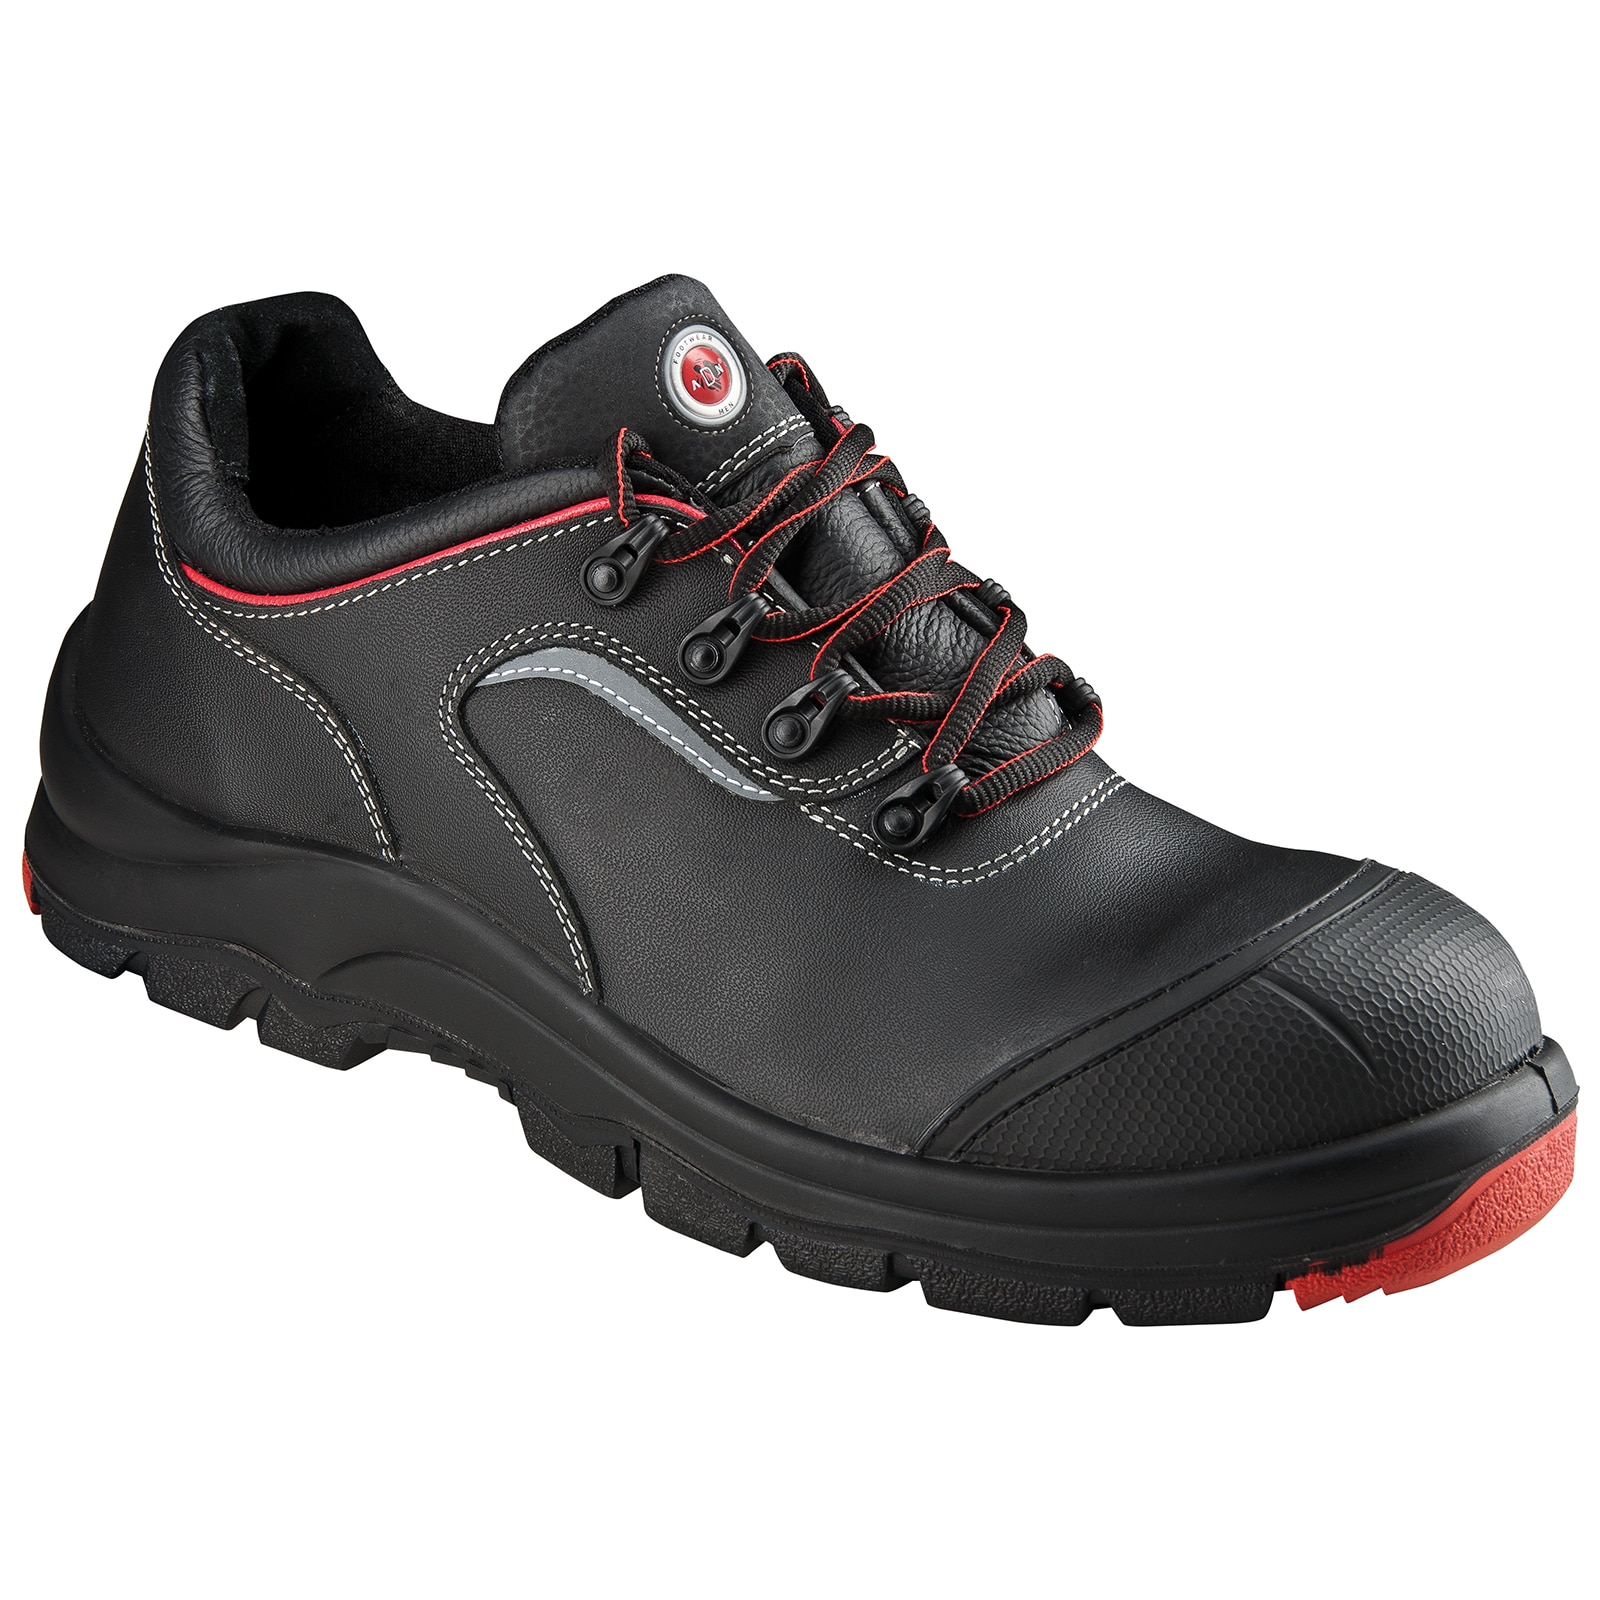 stiluri de moda stil de viață nou frumosi pantofi Incaltaminte de protectie pantofi fara elemente metalice, bombeu din fibra  de sticla si talpa din Kevlar flexibil, marime 43-HOBARTLOW - eMAG.ro